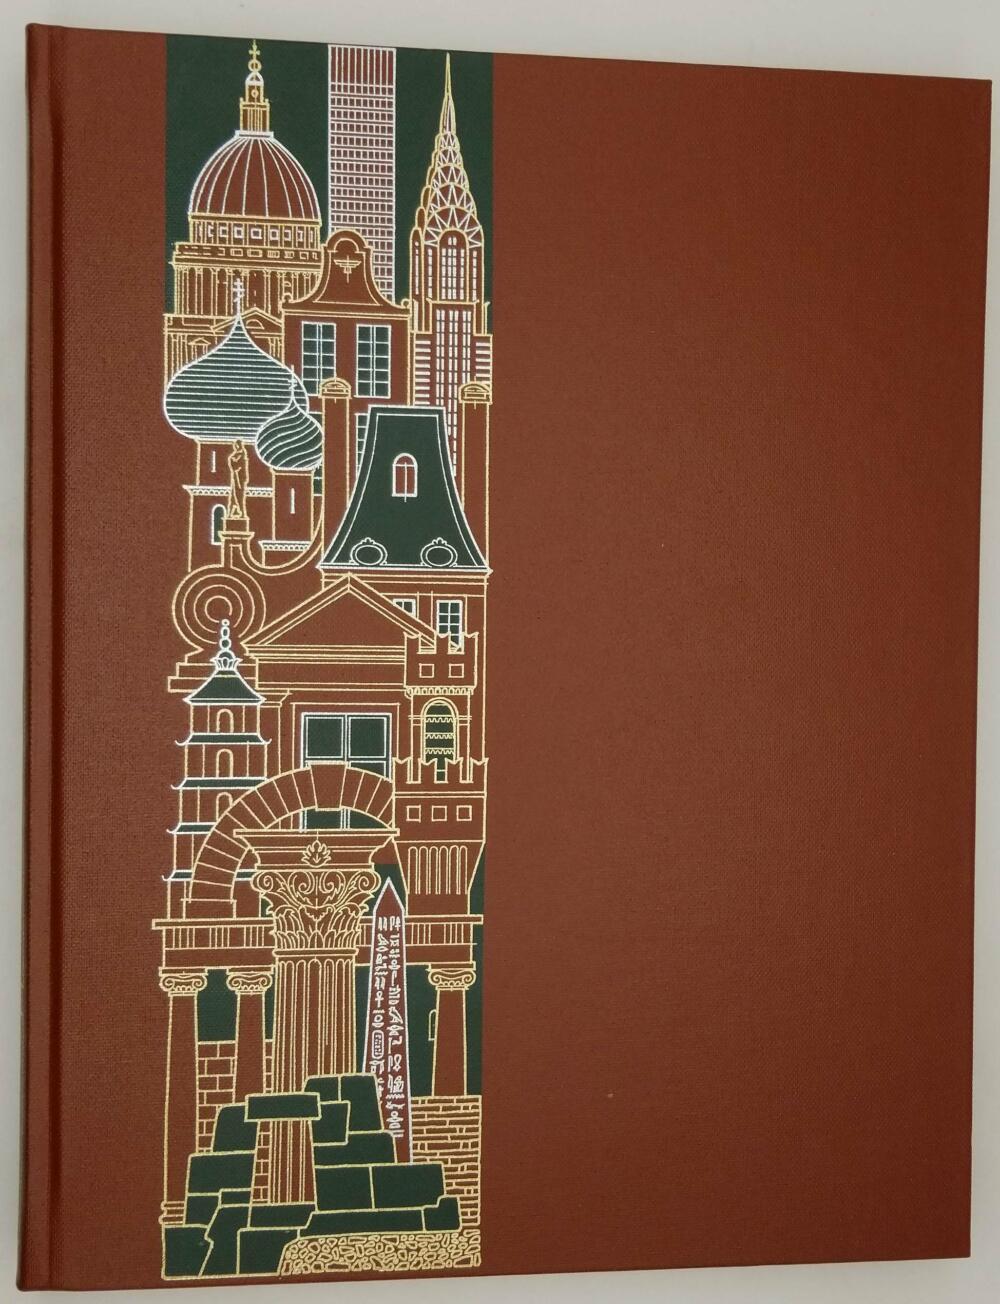 Cities And Civilizations - Christopher Hibbert 2003 | Folio Society